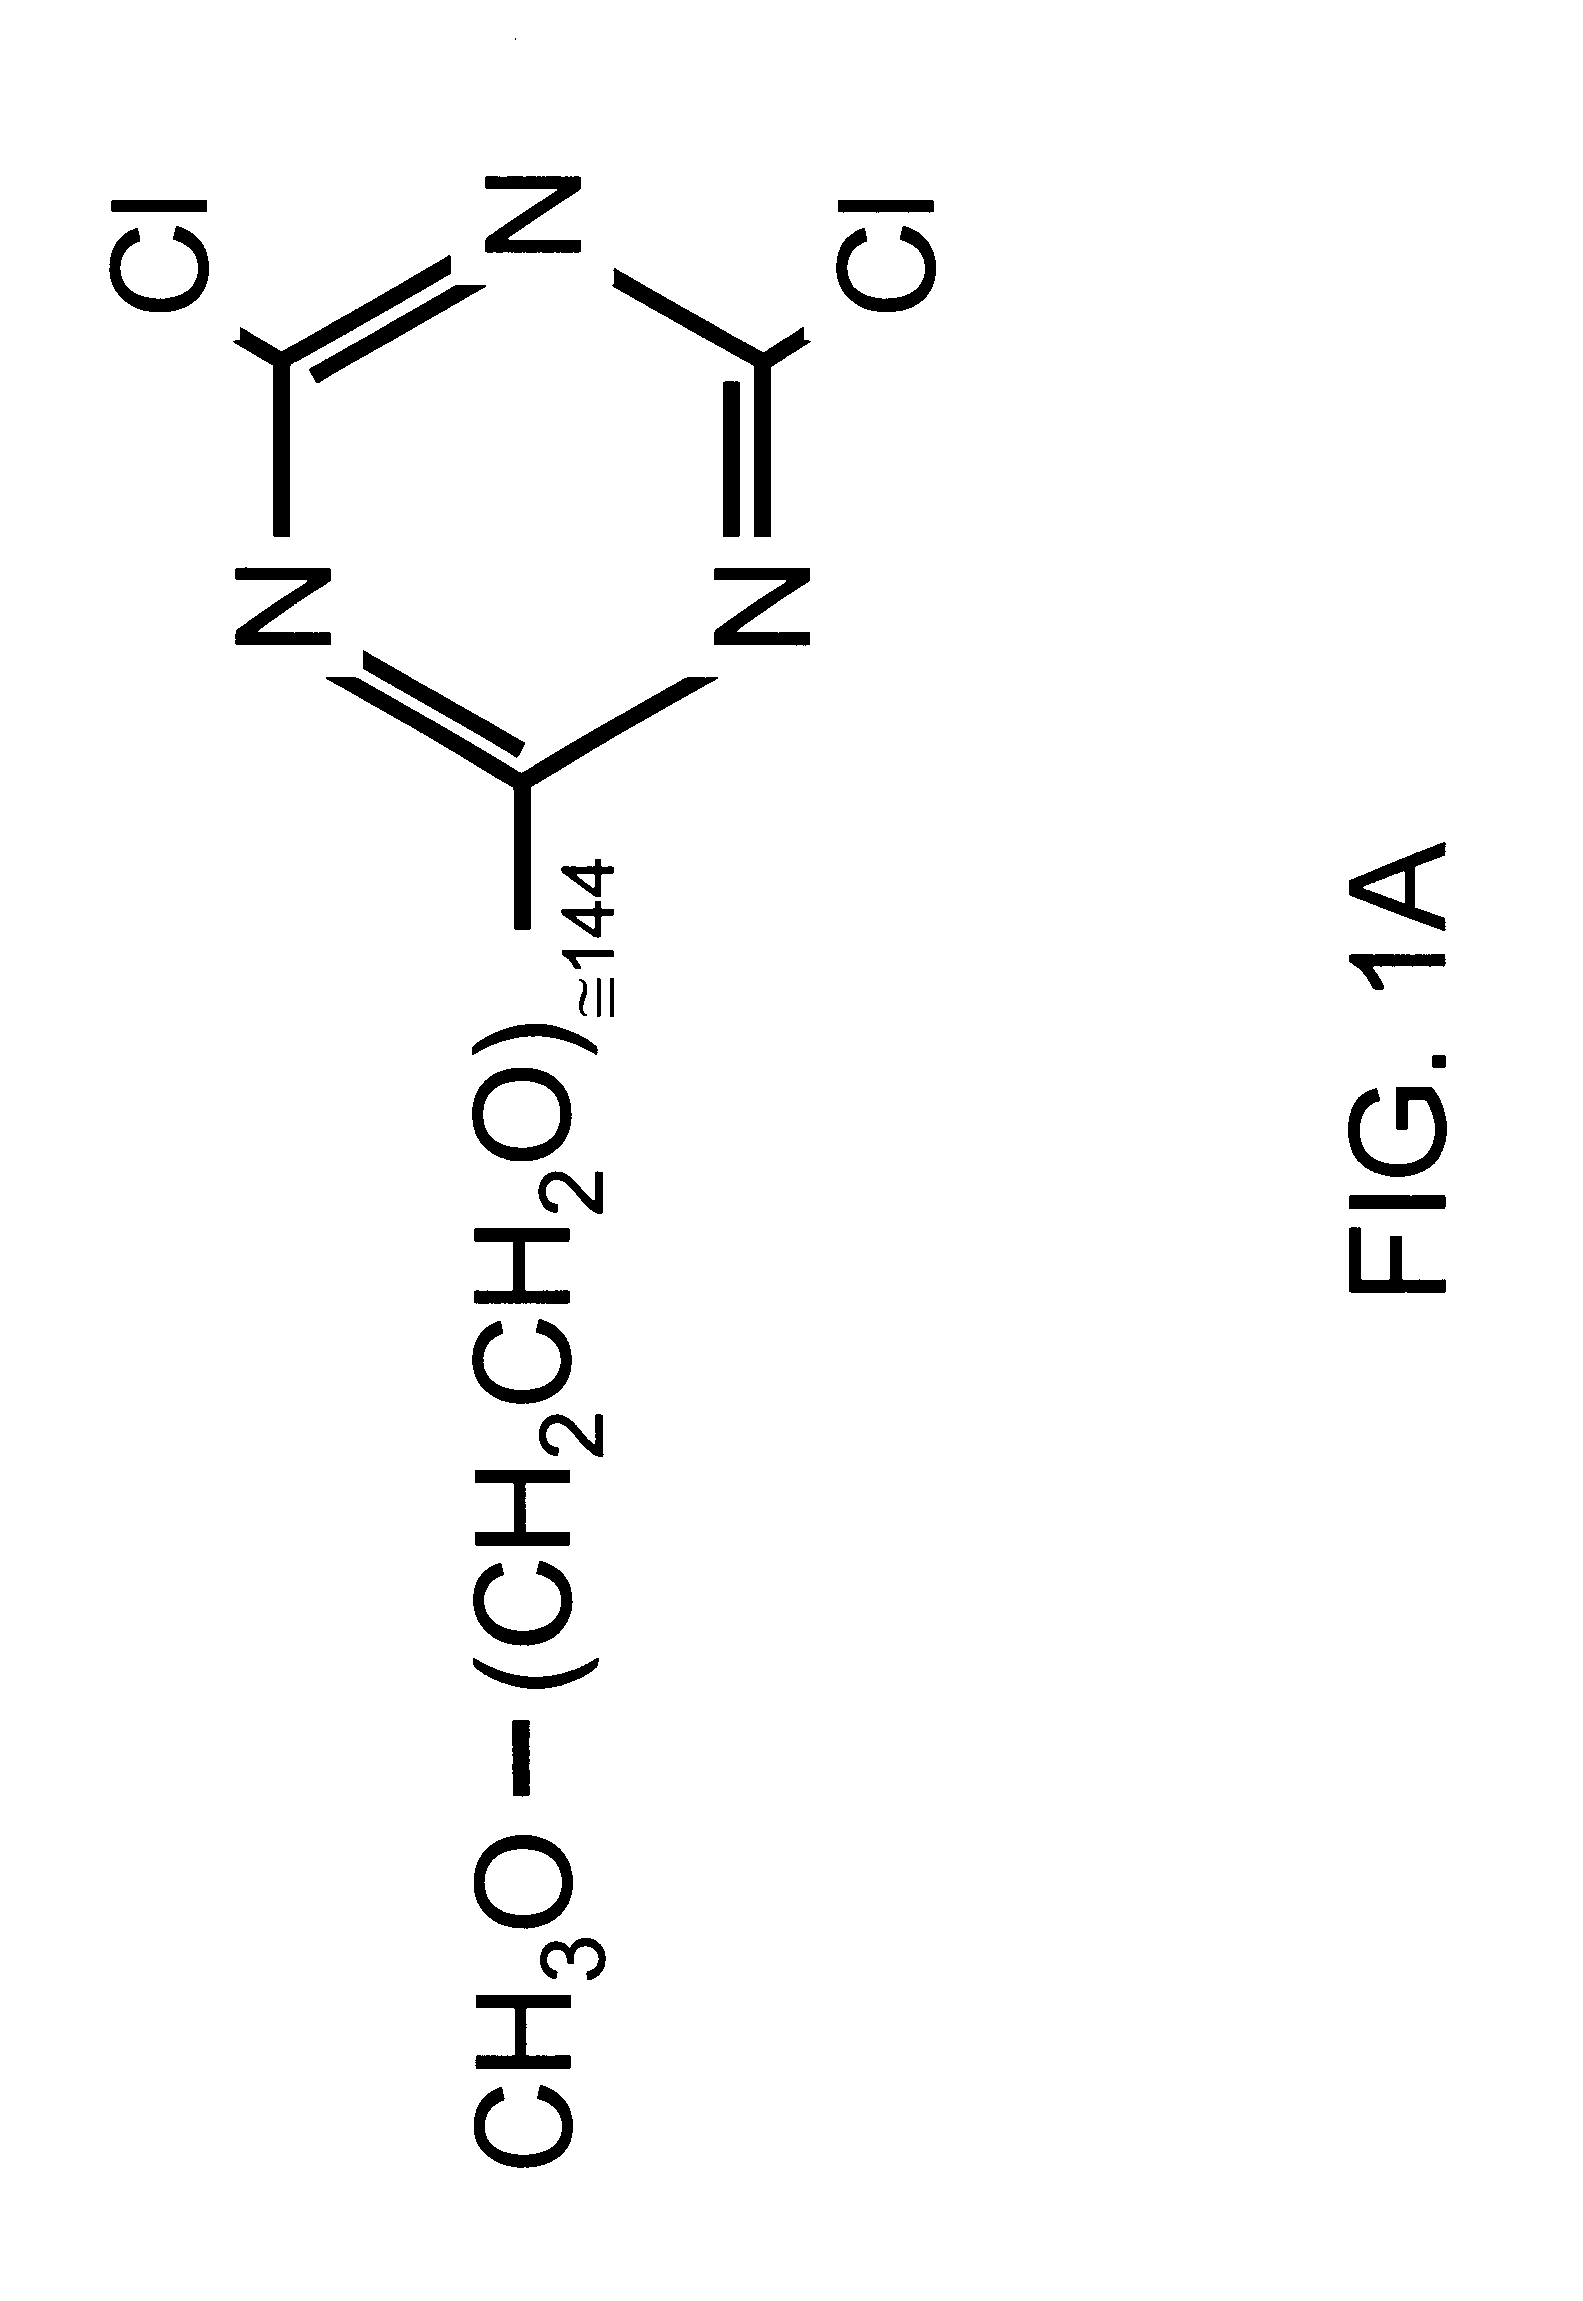 how to say polyethylene glycol